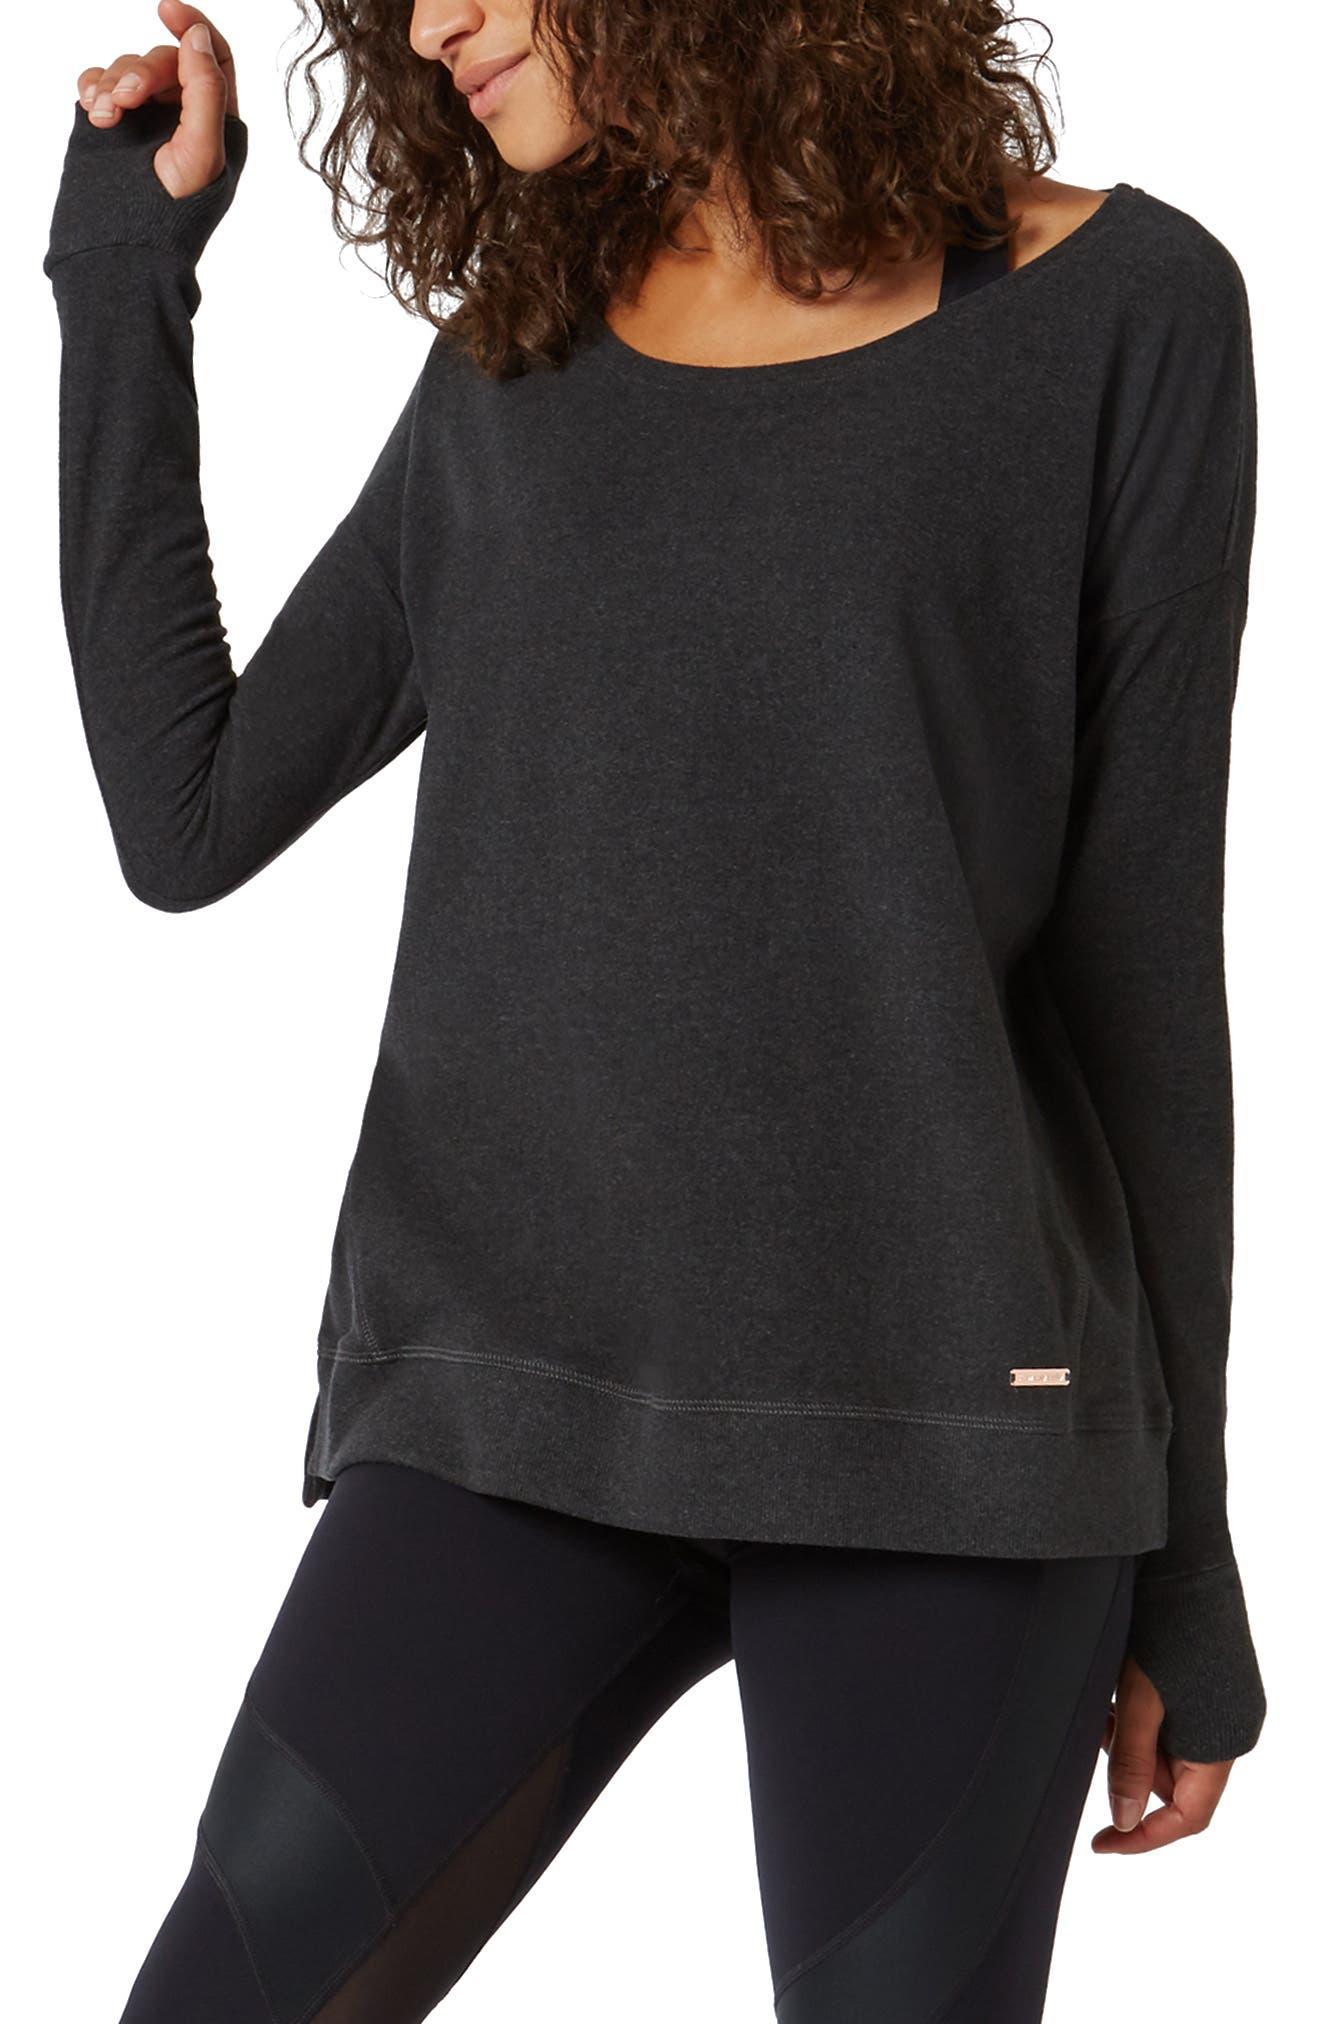 Luxe Simhasana Sweatshirt,                             Main thumbnail 1, color,                             BLACK MARL